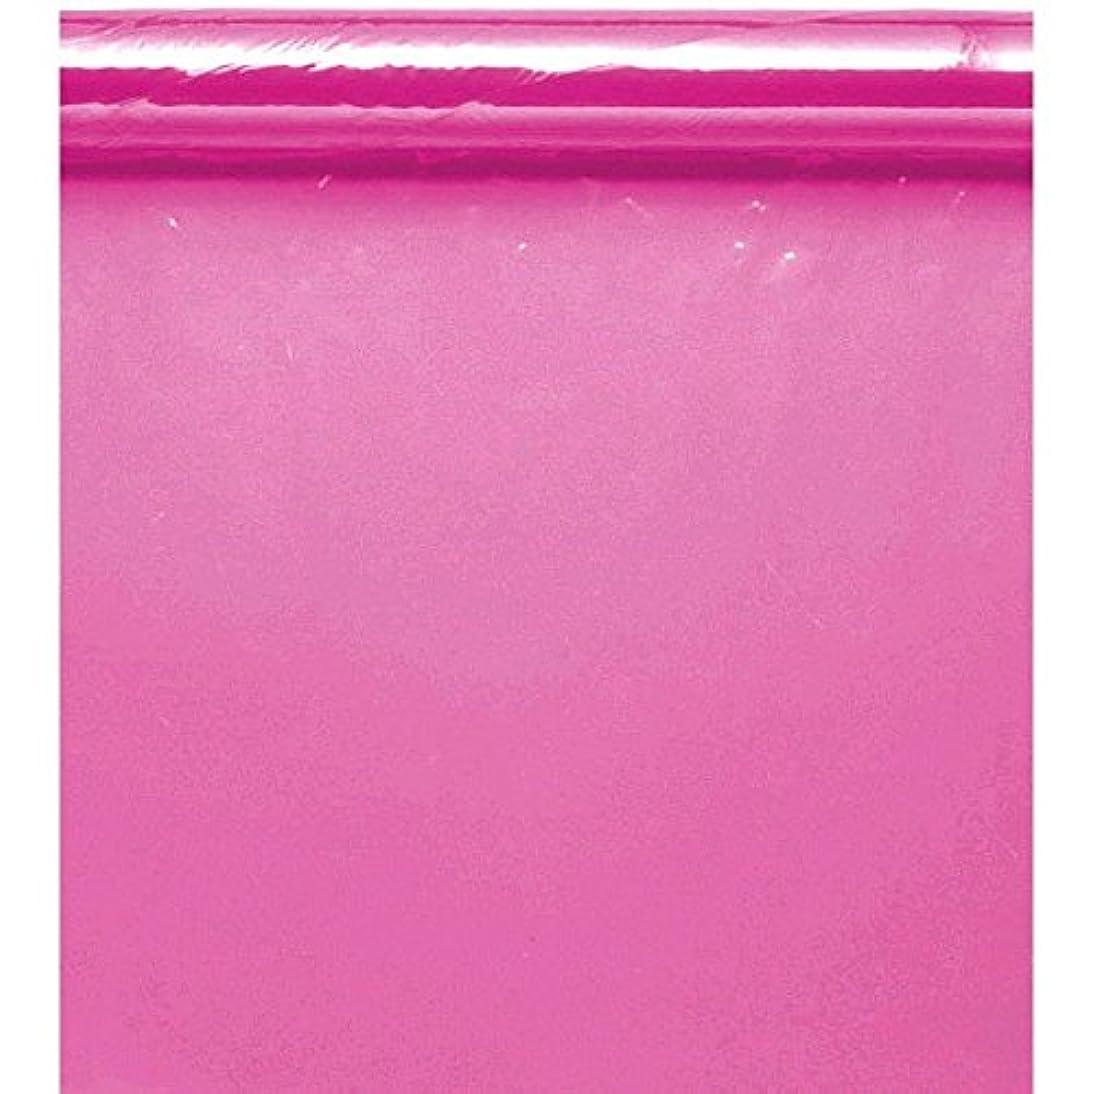 Amscan 189100 Cello Wrap, 20 inches x 100 feet, Pink